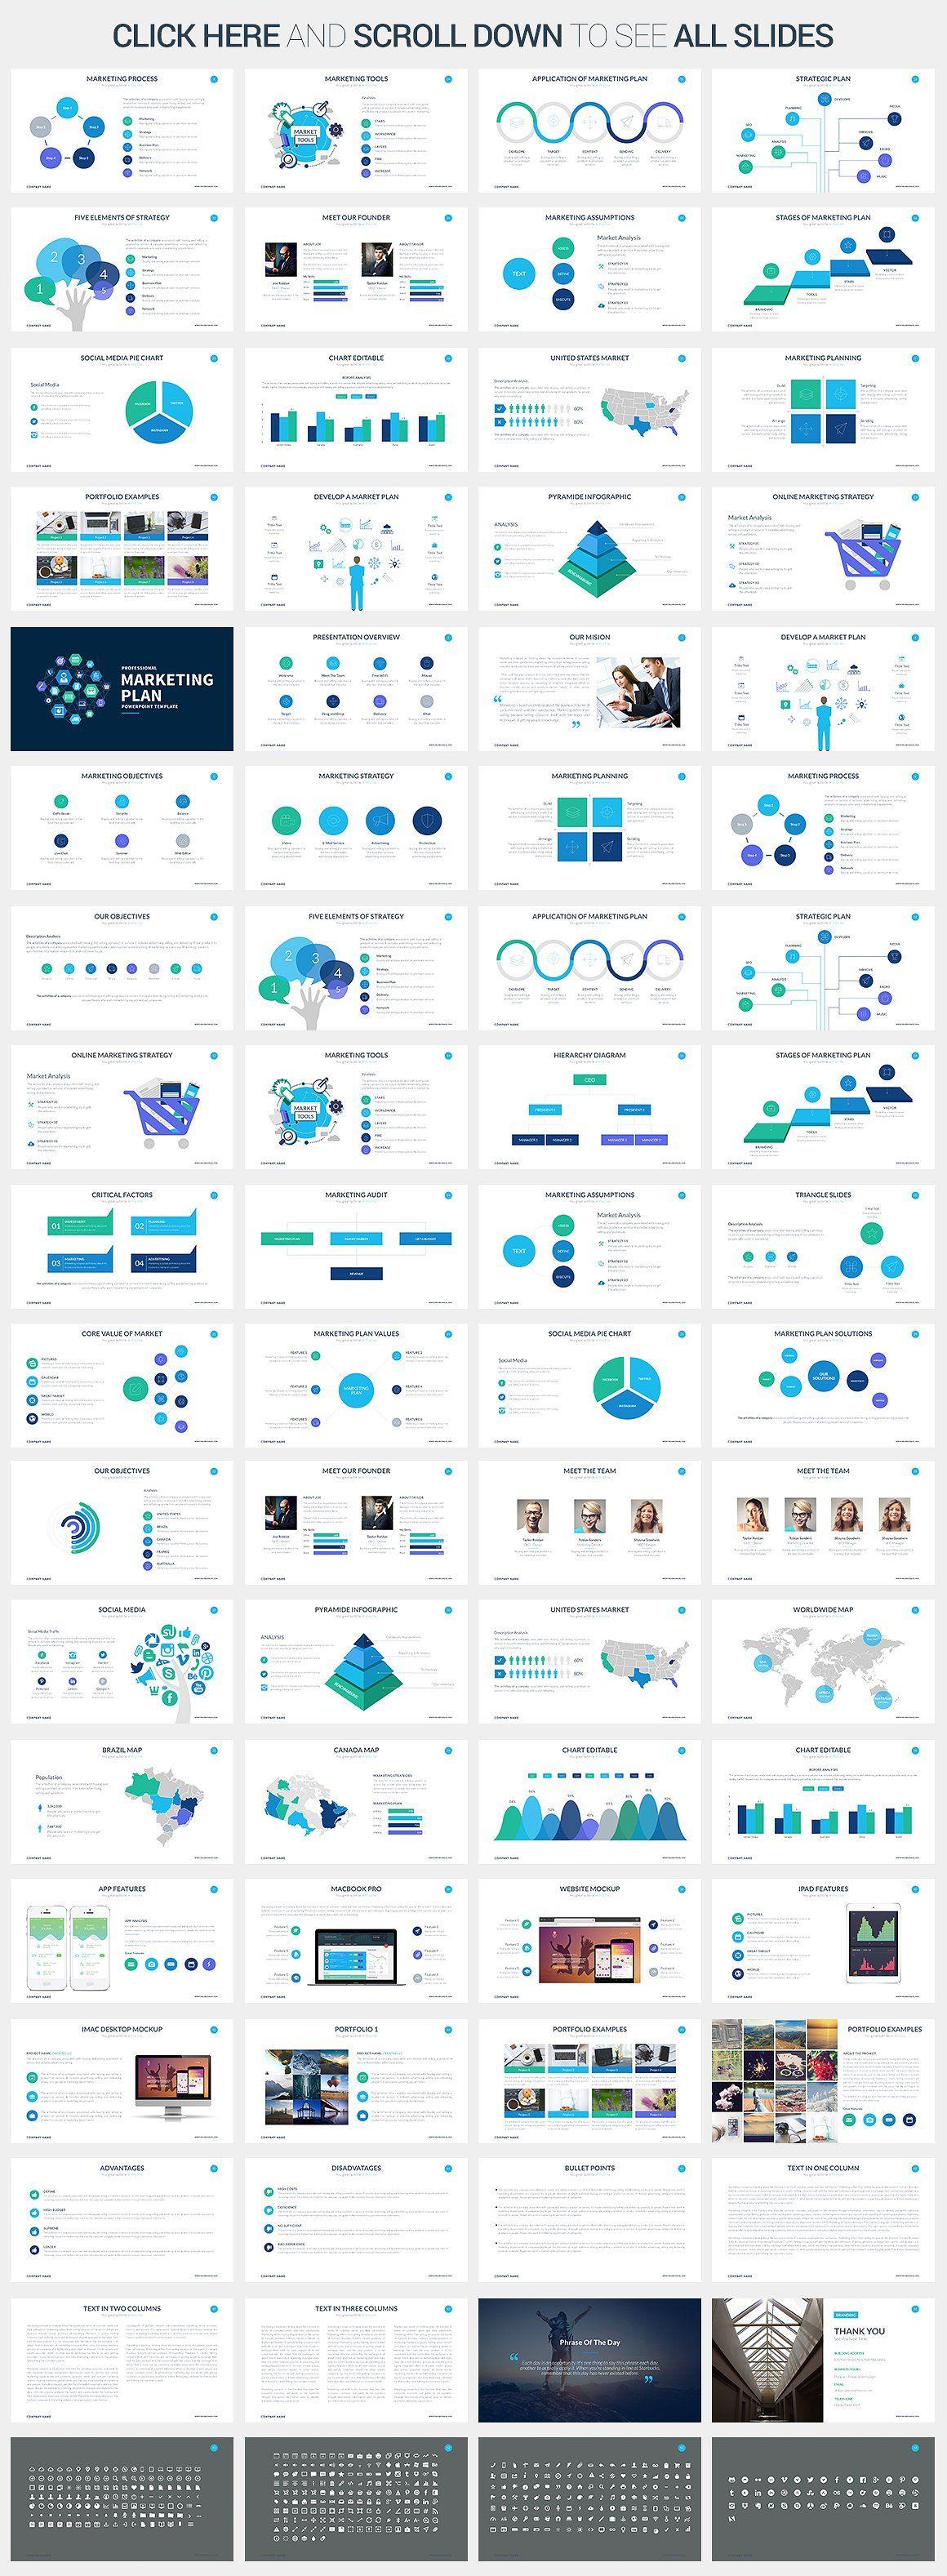 Marketing Plan - Keynote Template by SlidePro on @creativemarket ...